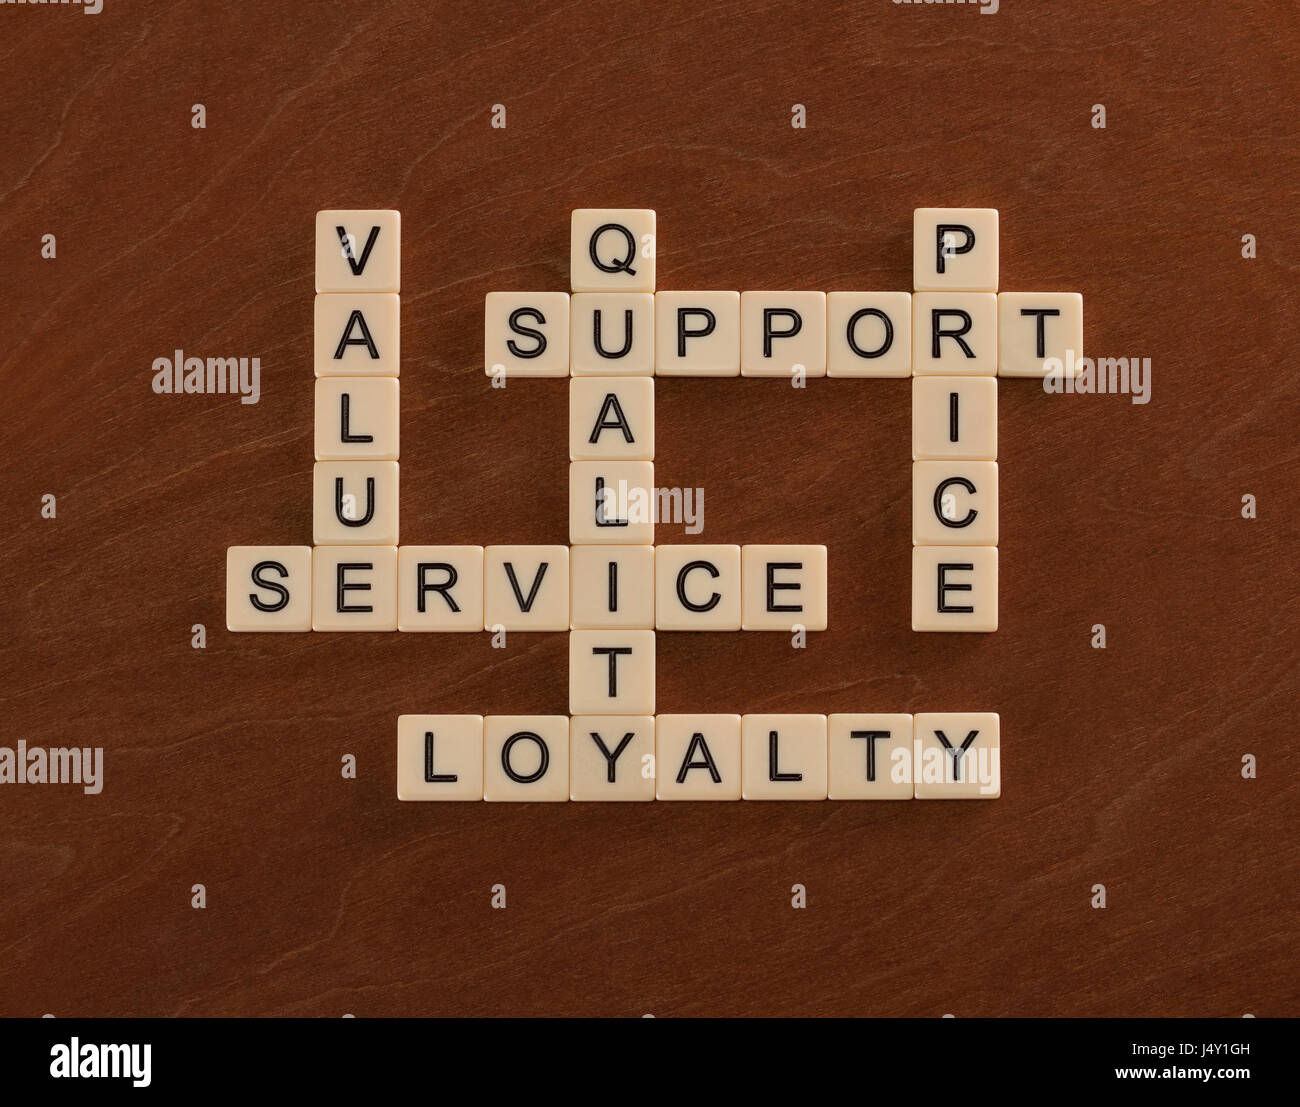 loyalität kreuzworträtsel